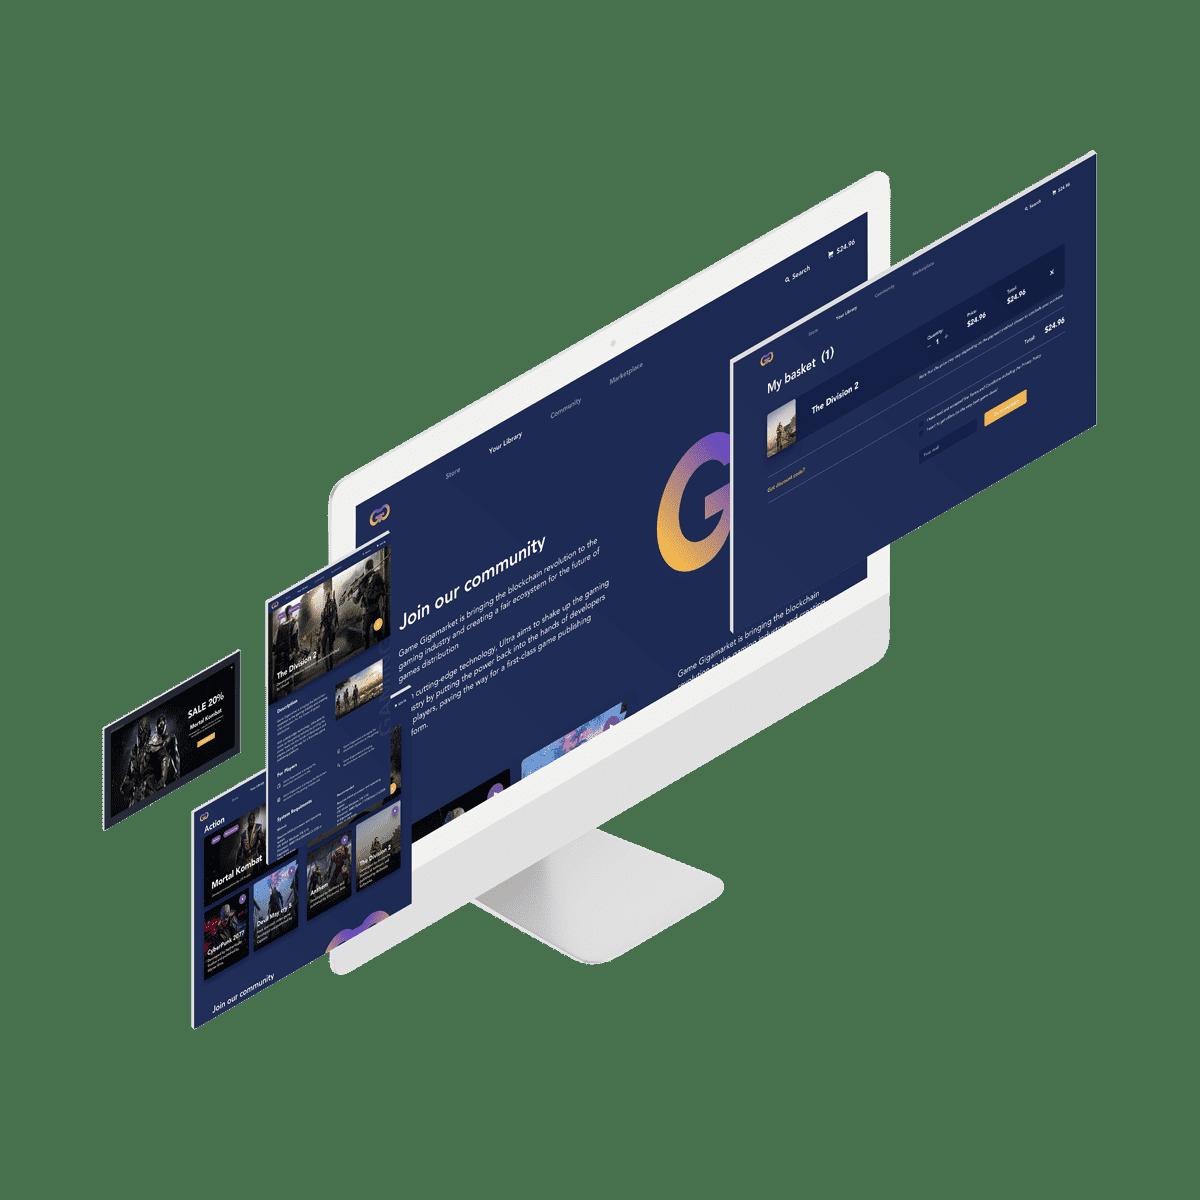 Game platform design on monitor